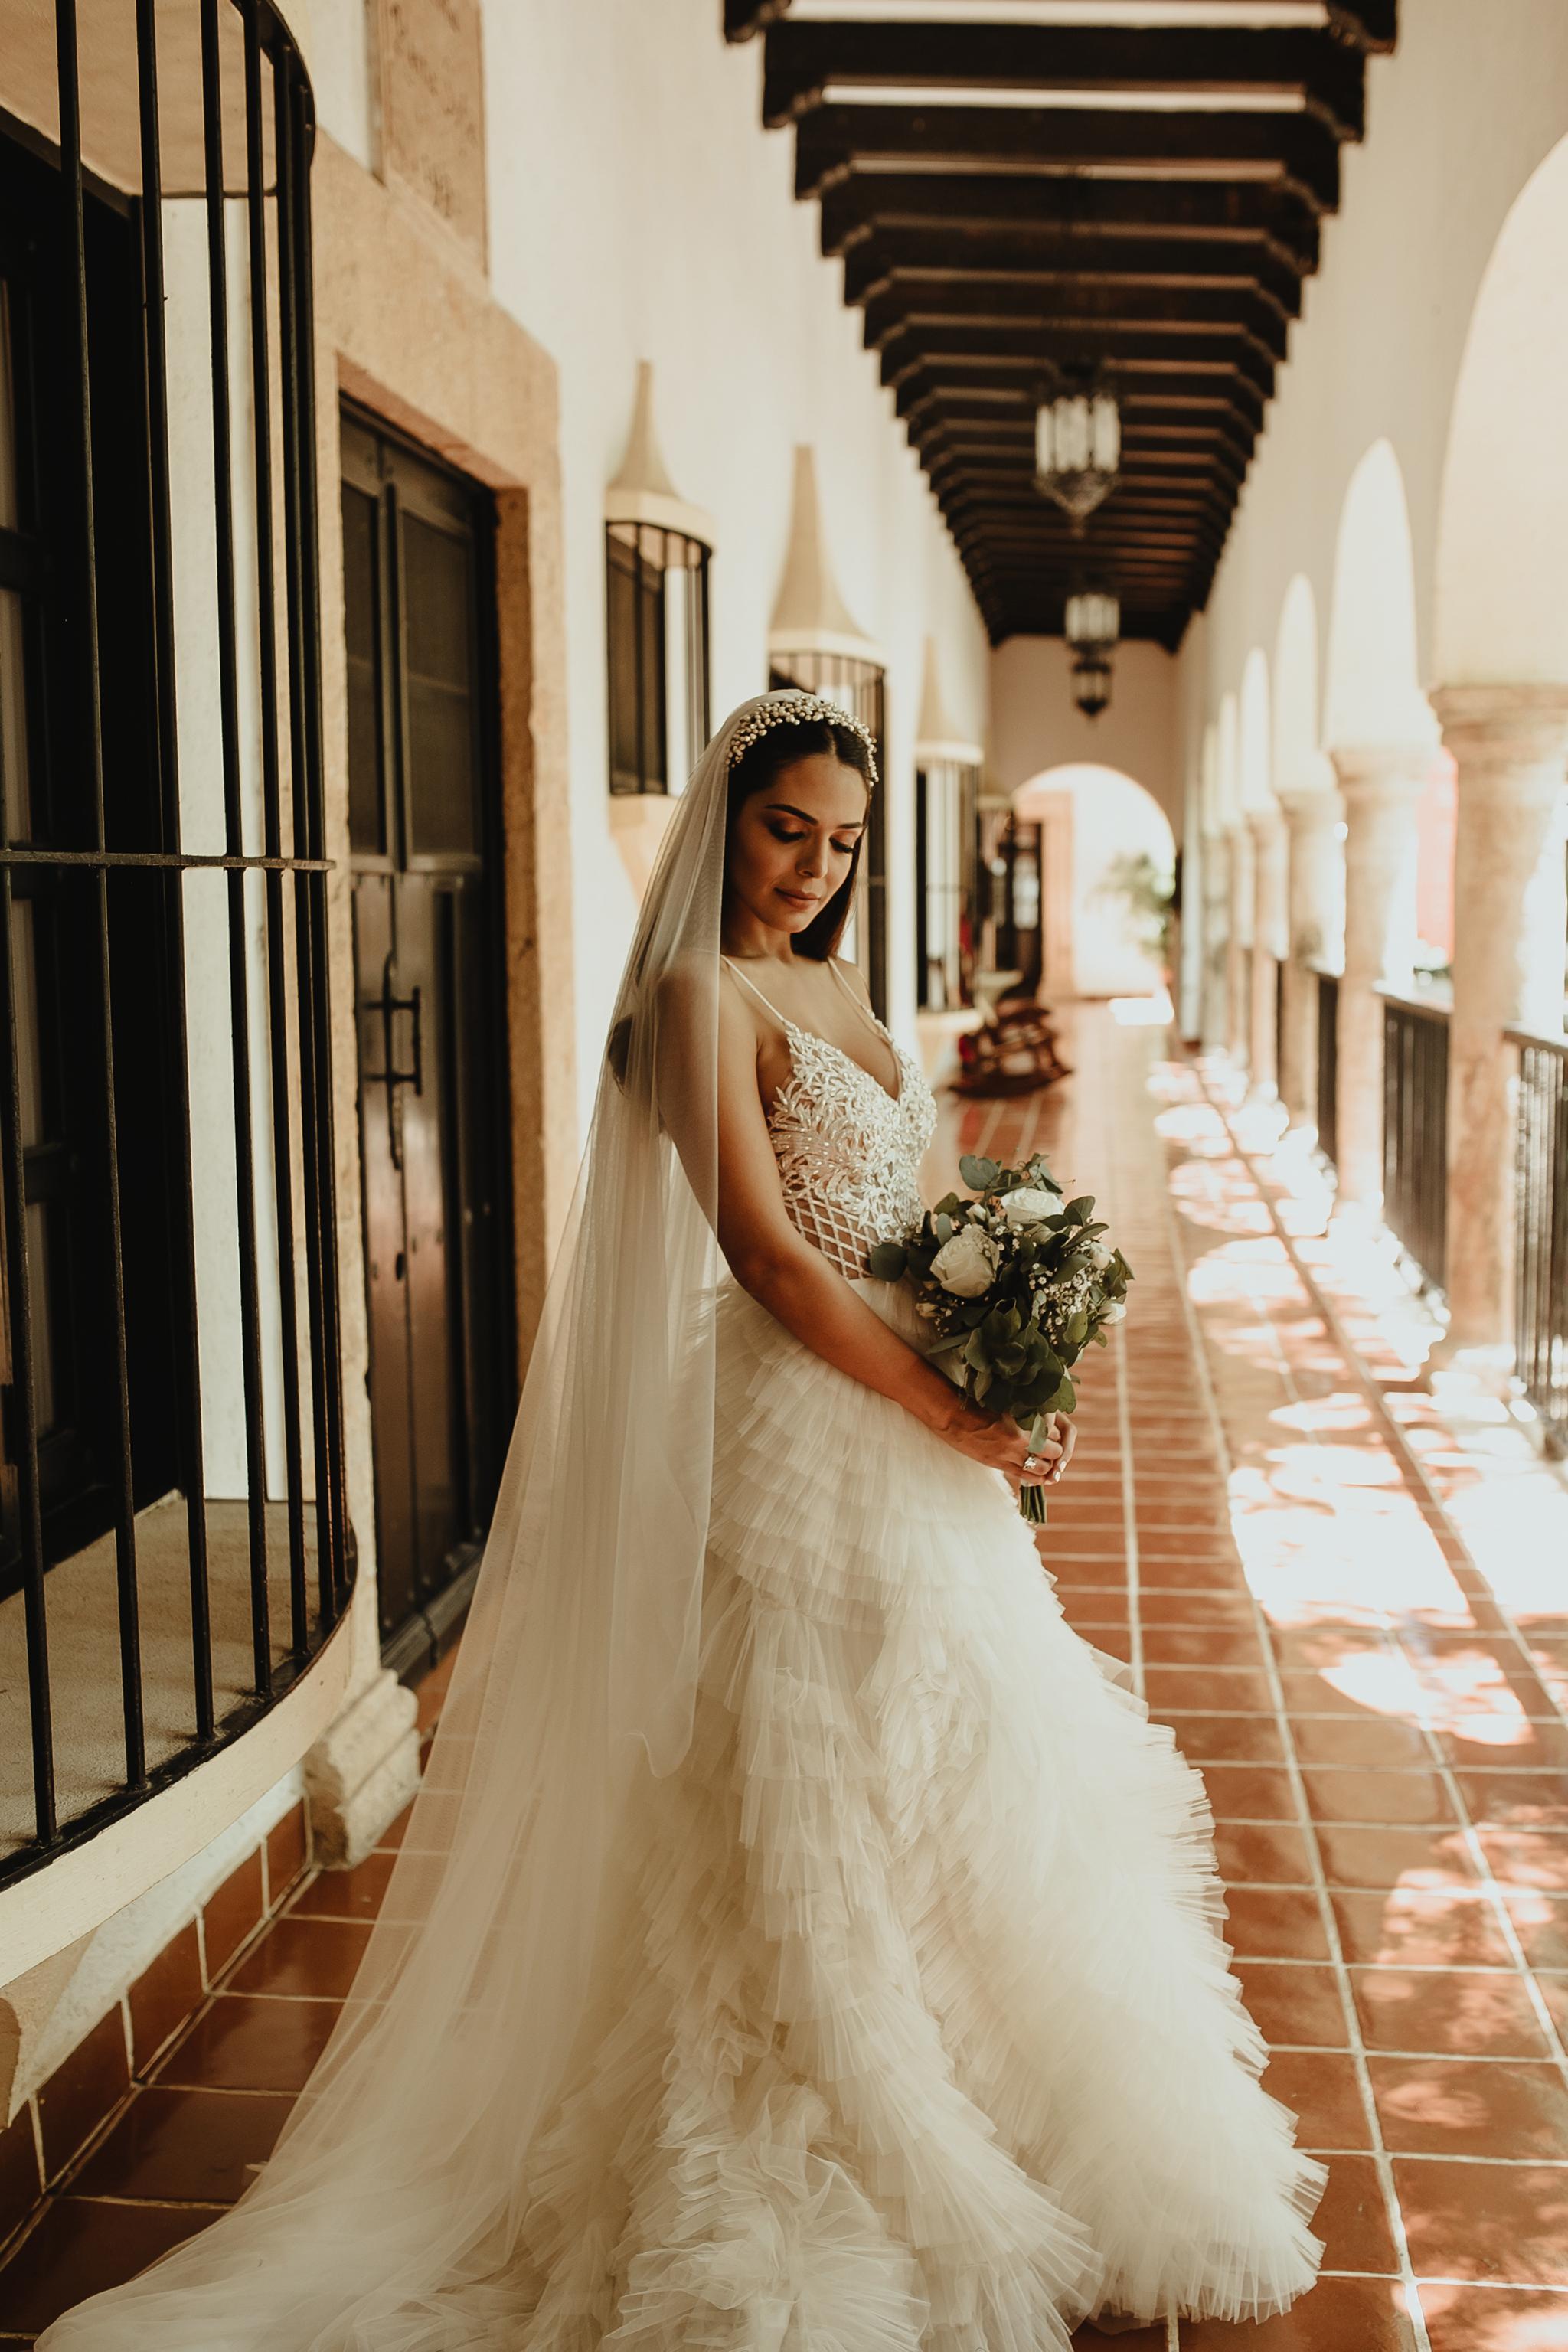 0143R&F__WeddingDestination_Weddingmerida_BodaMexico_FotografoDeBodas_FabrizioSimoneenFotografo.jpg